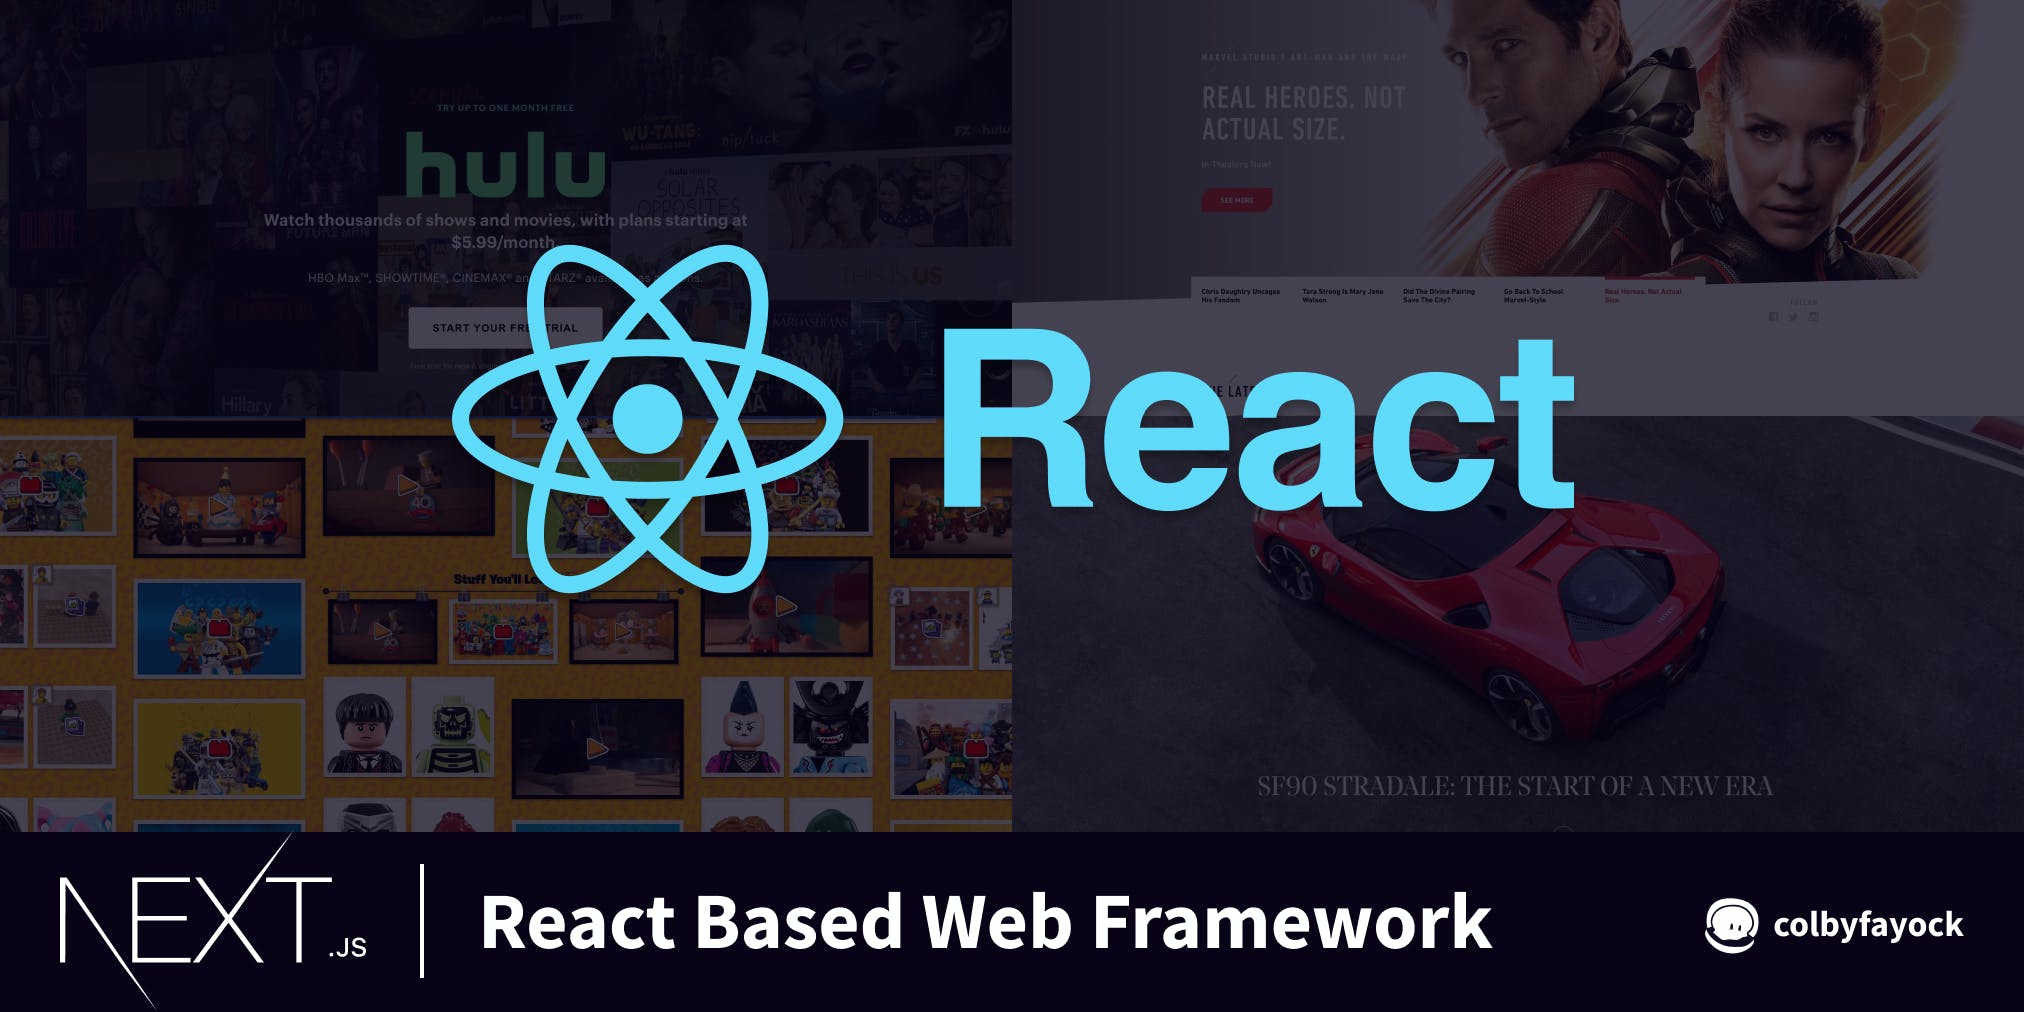 React based web framework